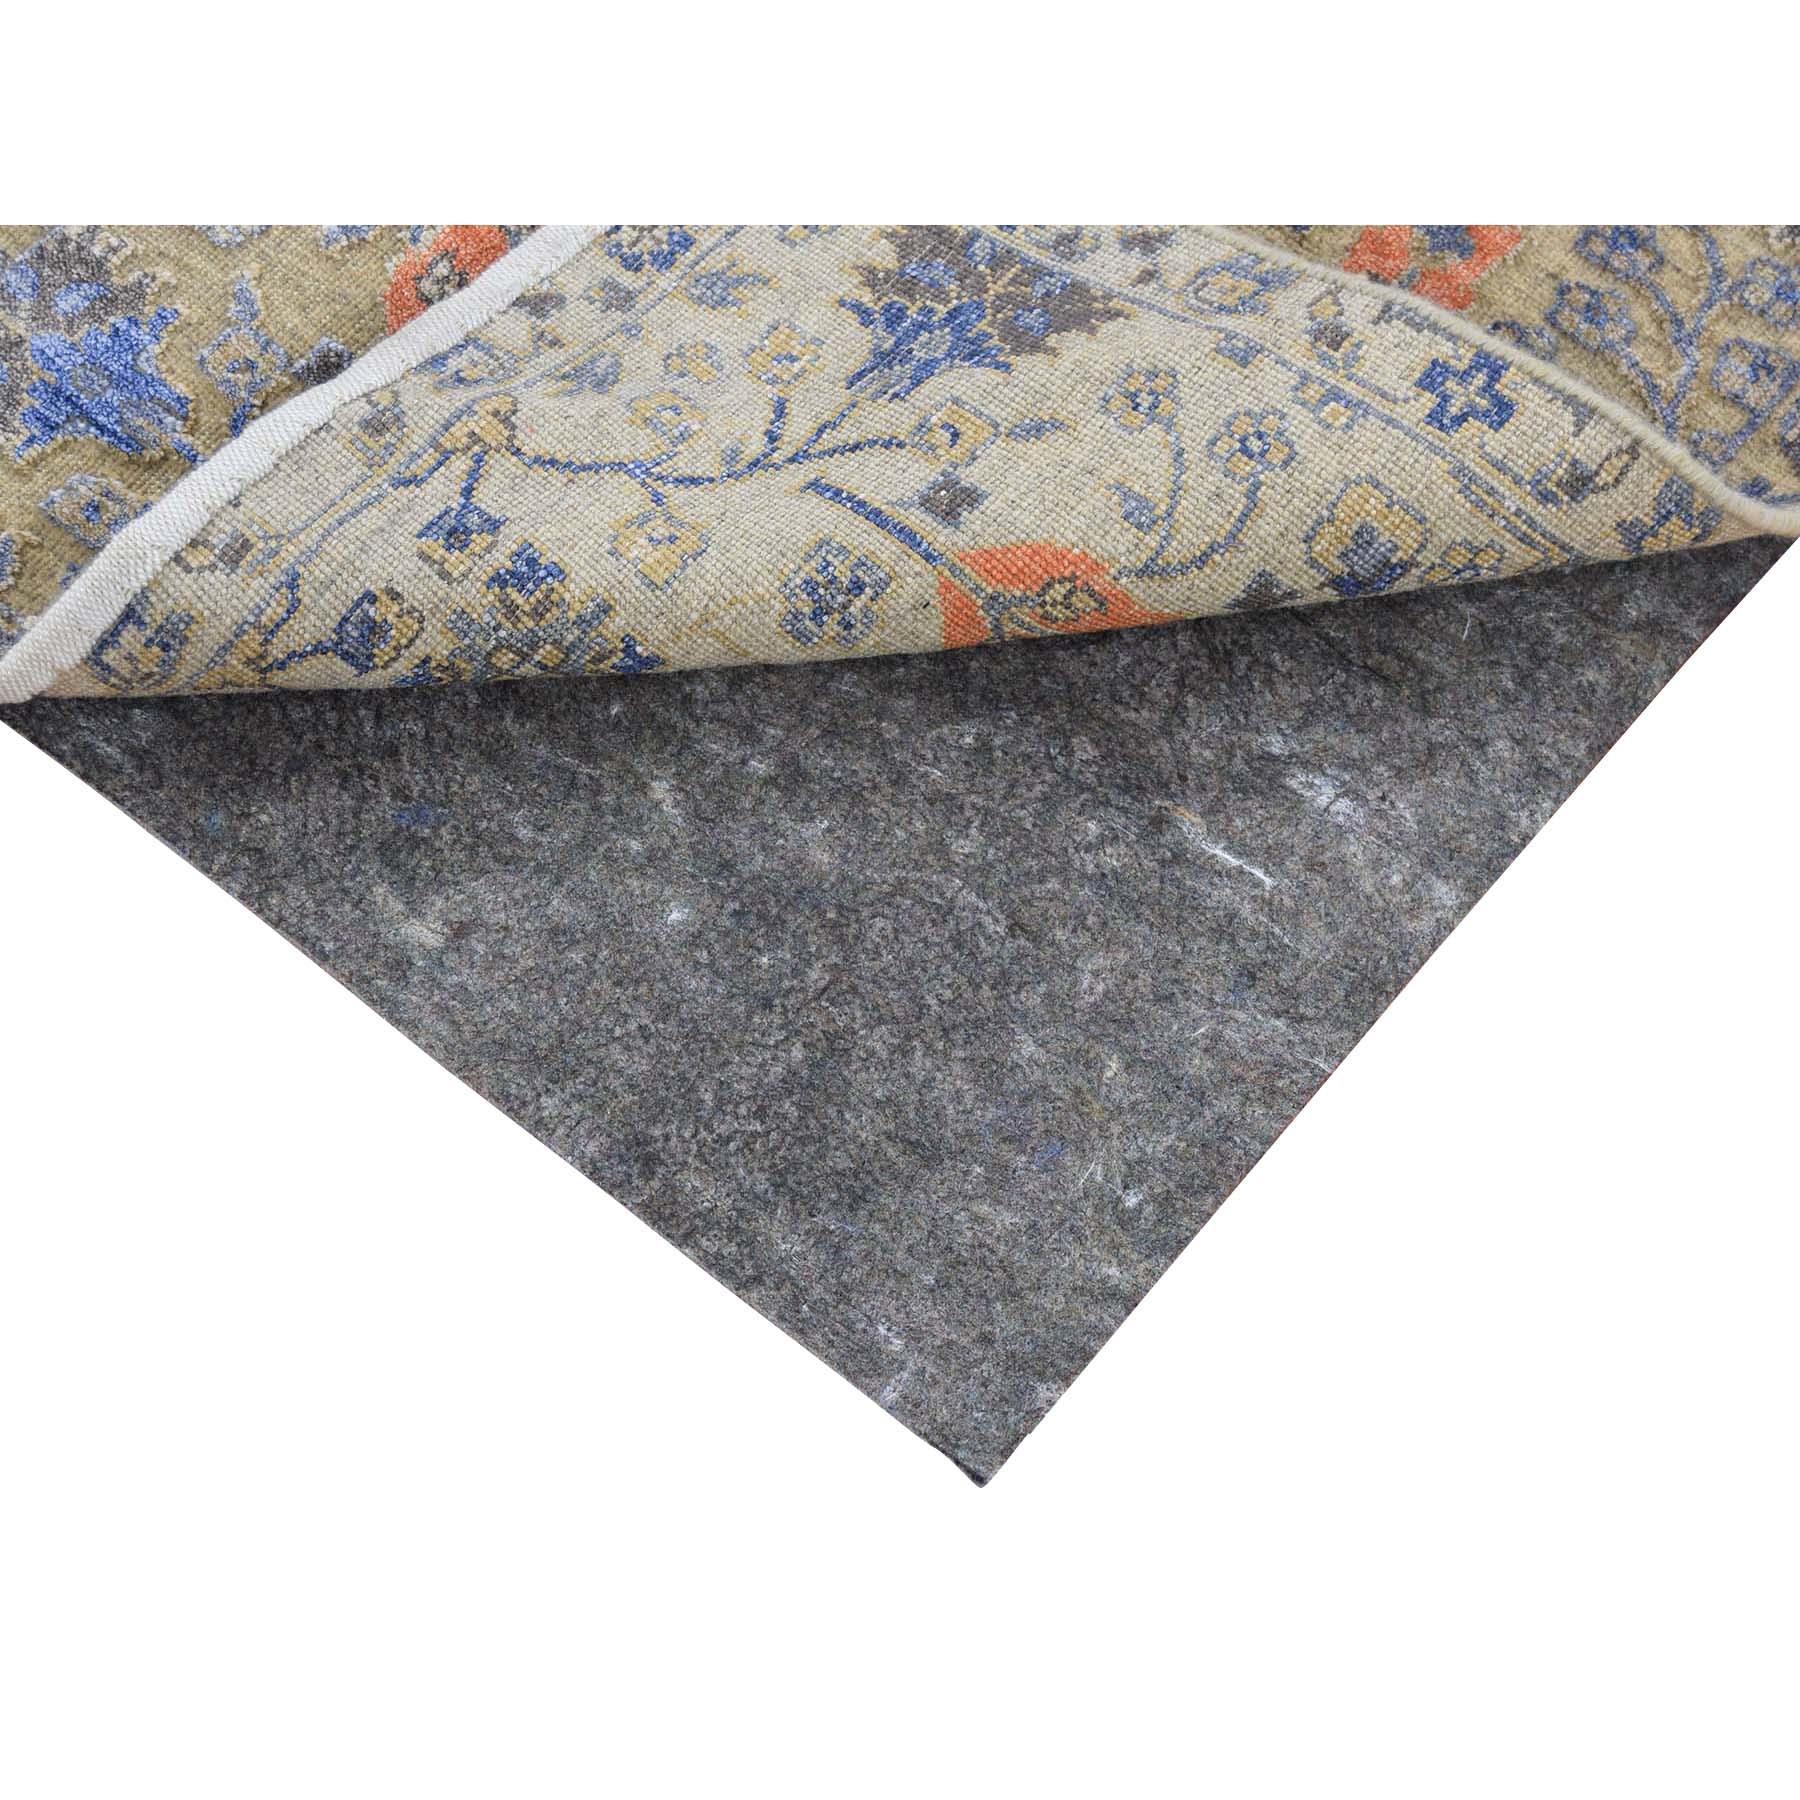 3/8  Thick High Quality Rug Pads (7- x 11-)